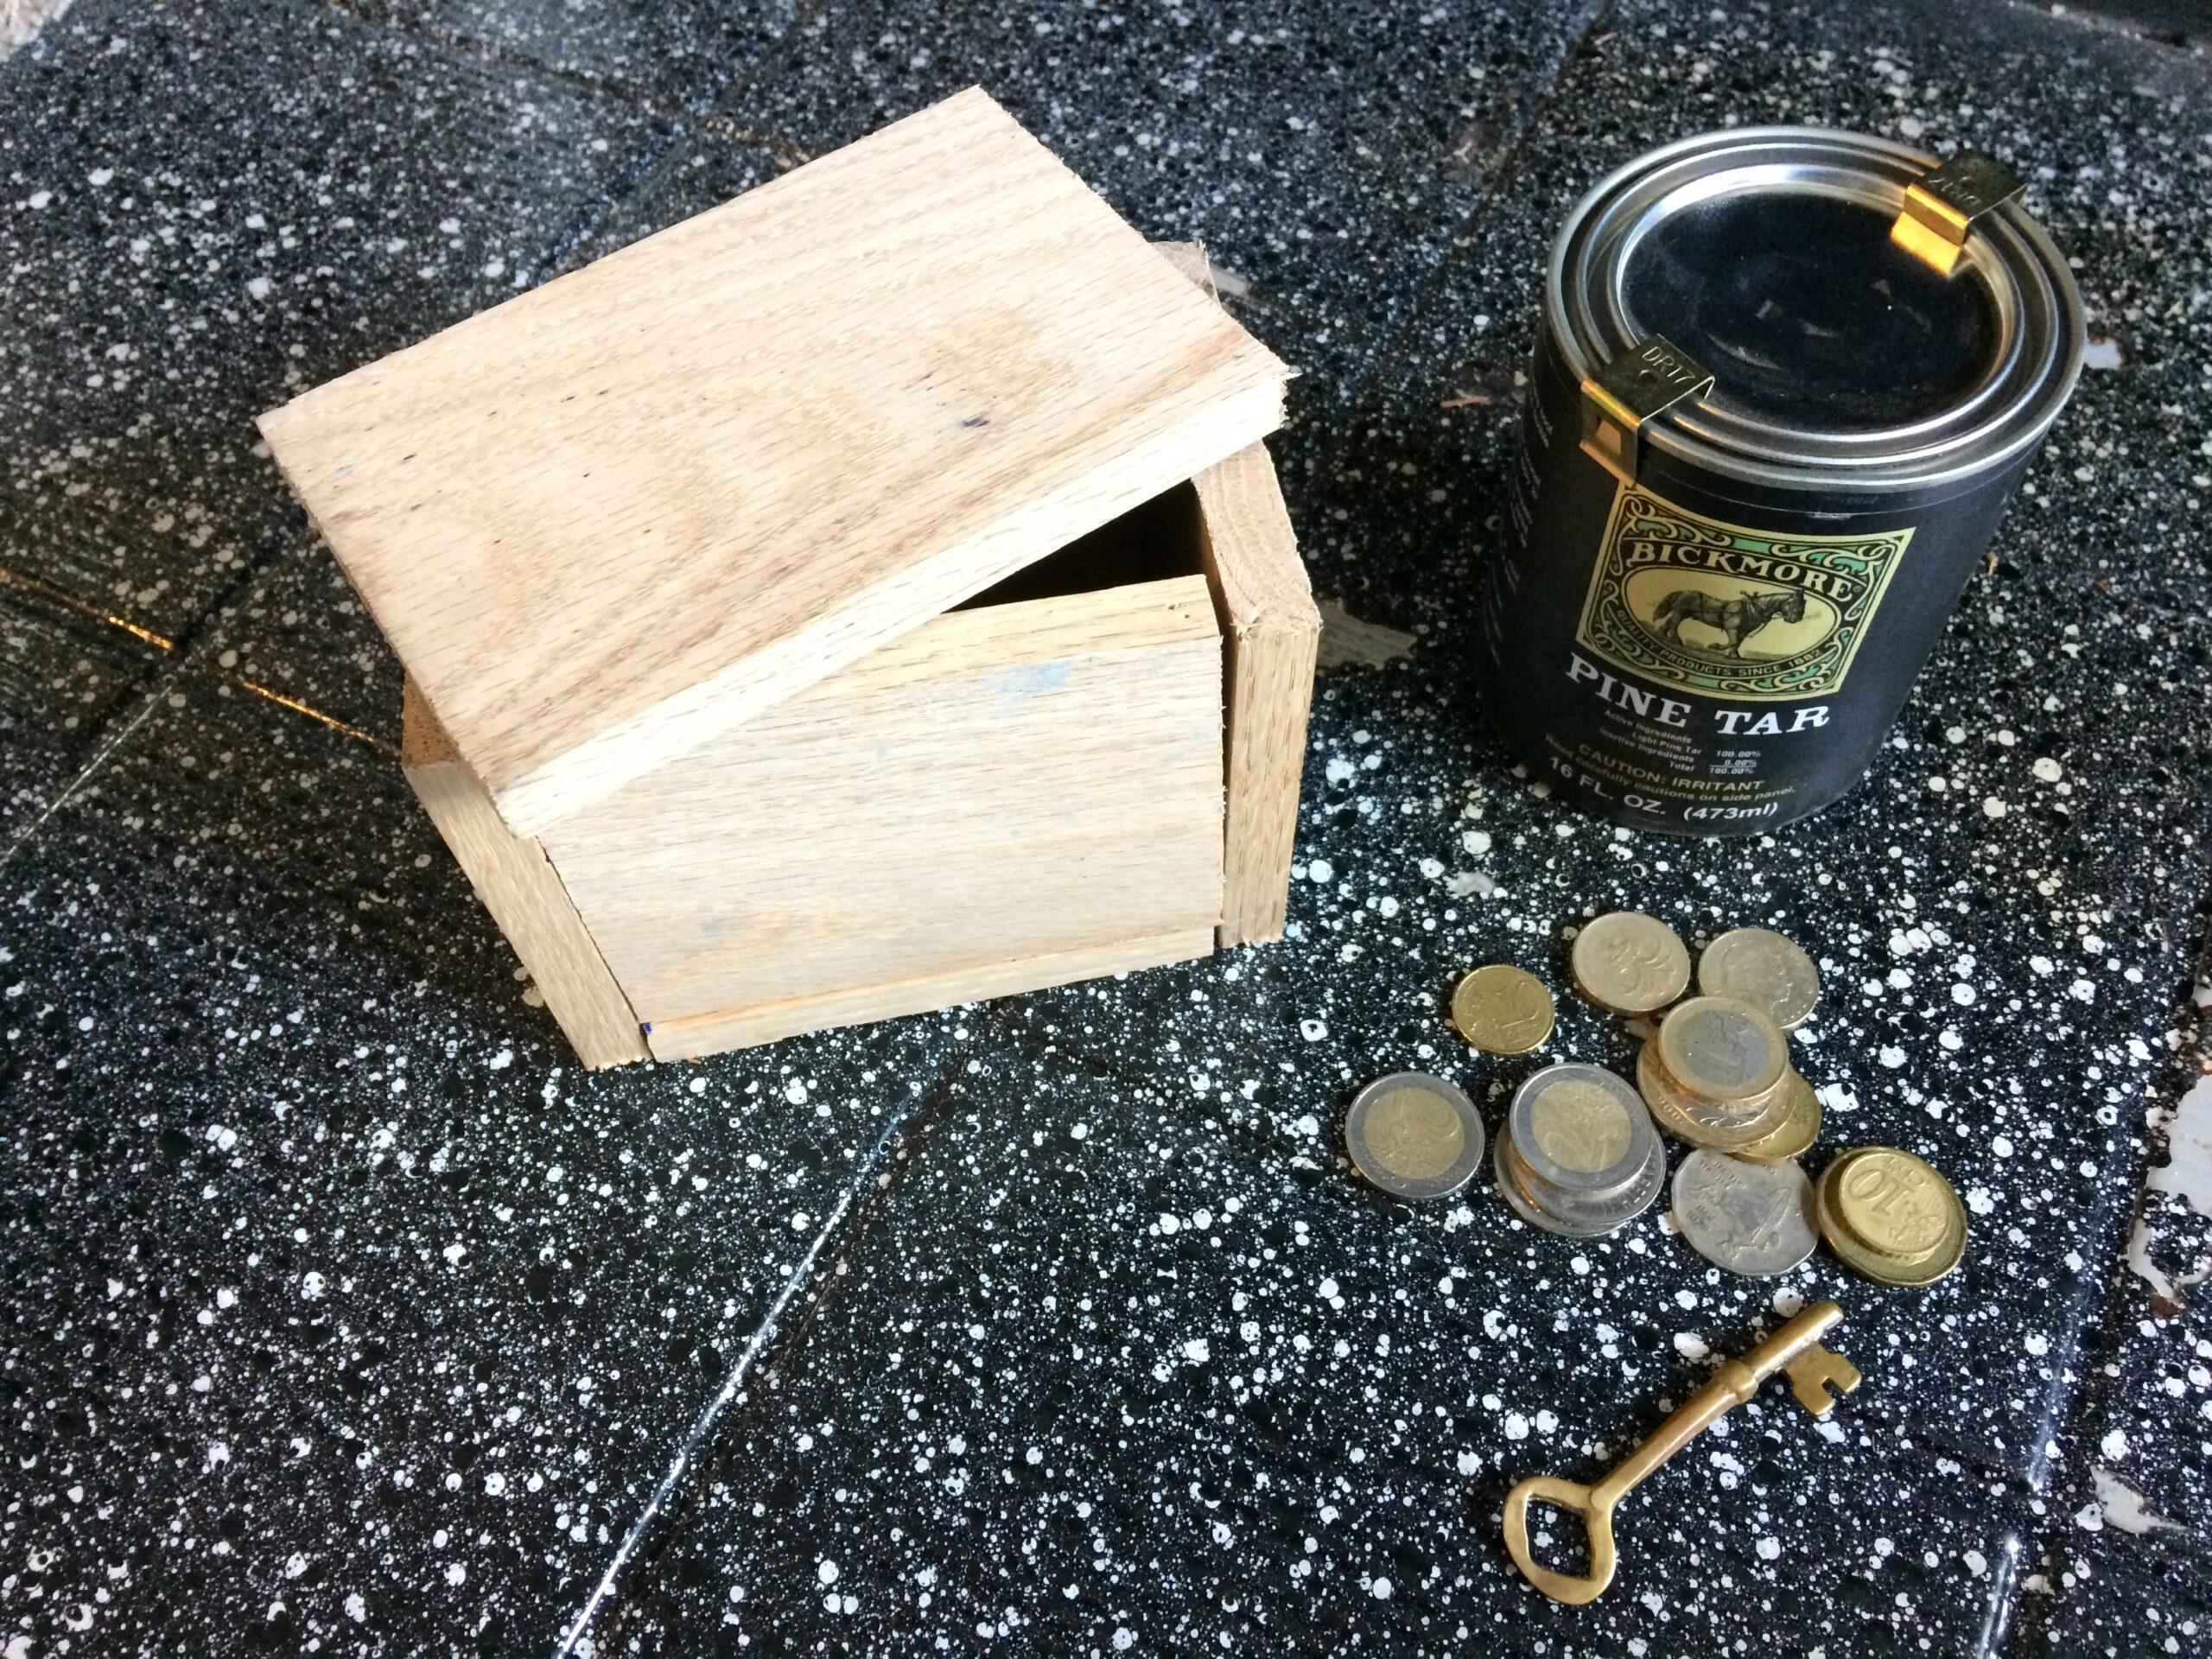 Materials to make a treasure chest